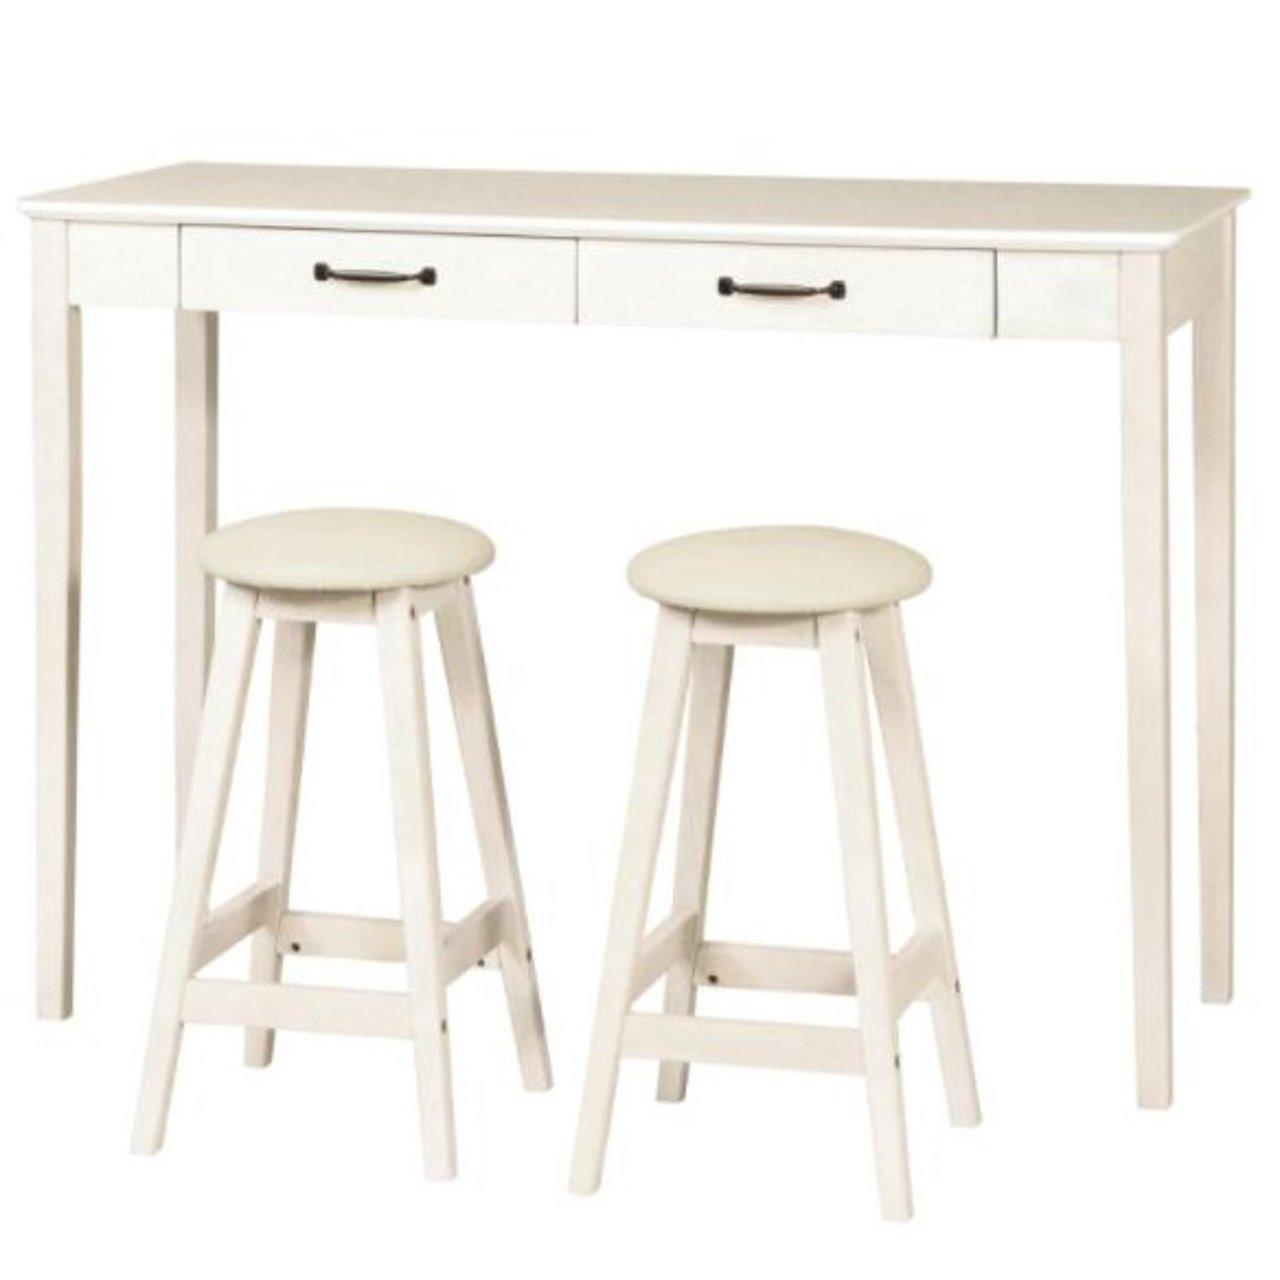 SINAPP ハイテーブル アンティーク調シリーズ ハイチェア 3点セット 木製ハイテーブル SIK0589 ホワイト B07BFWZRF7